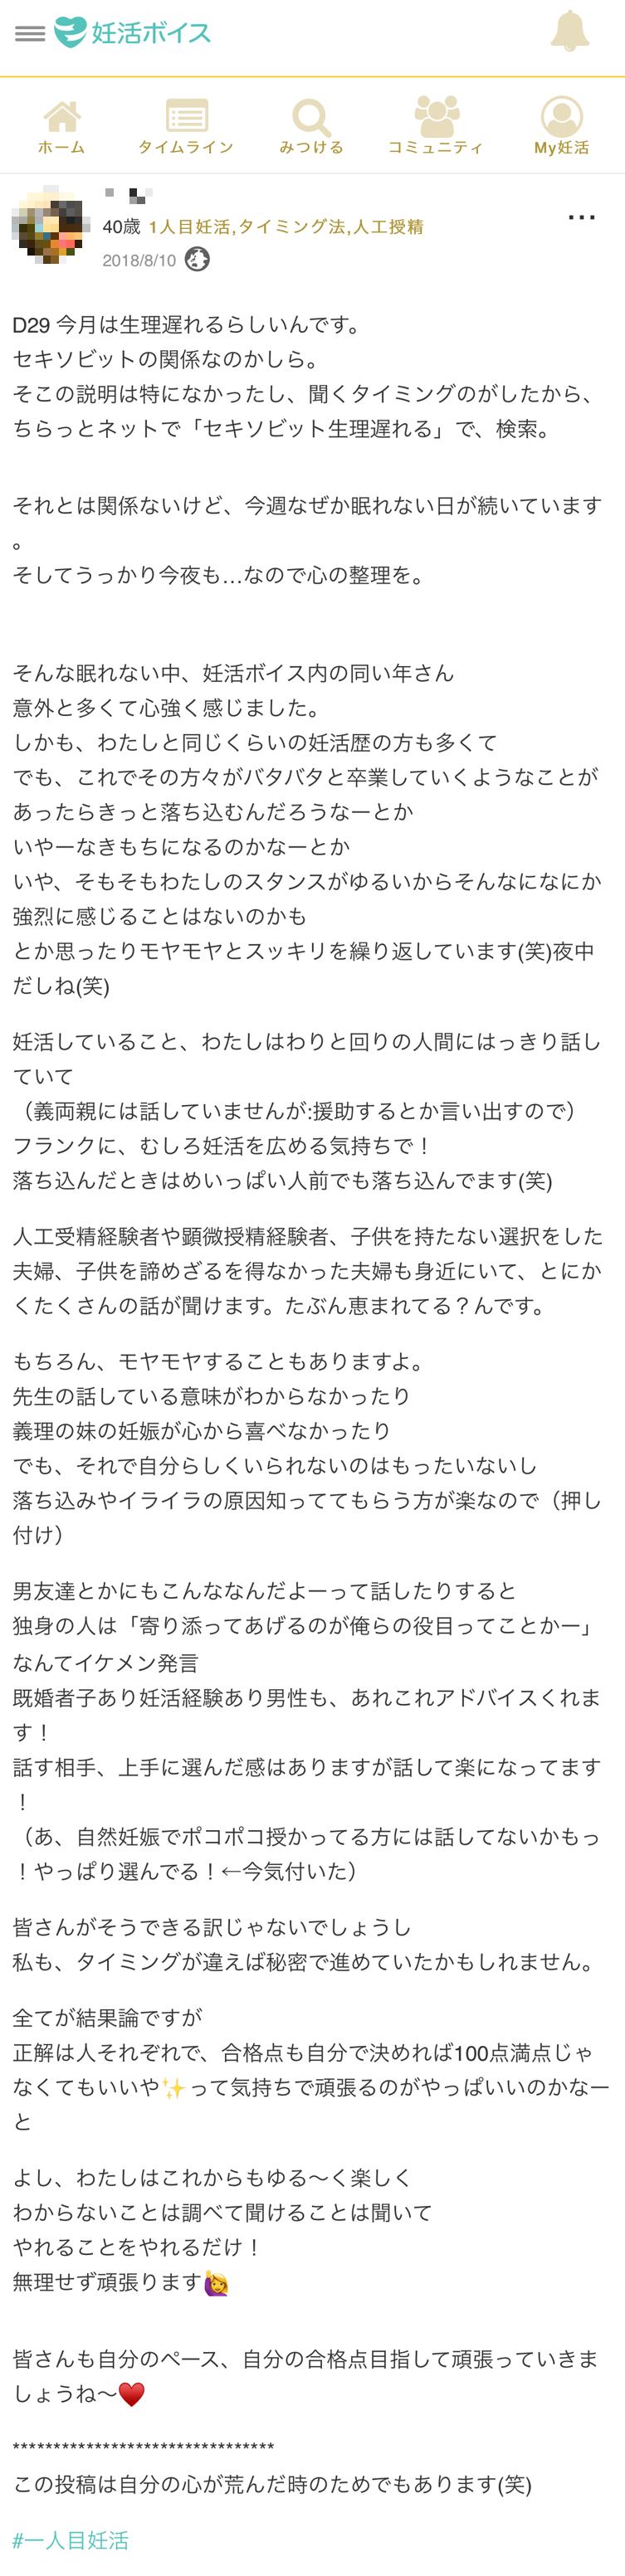 Pさん(40歳・1人目妊活・タイミング法・人工授精)